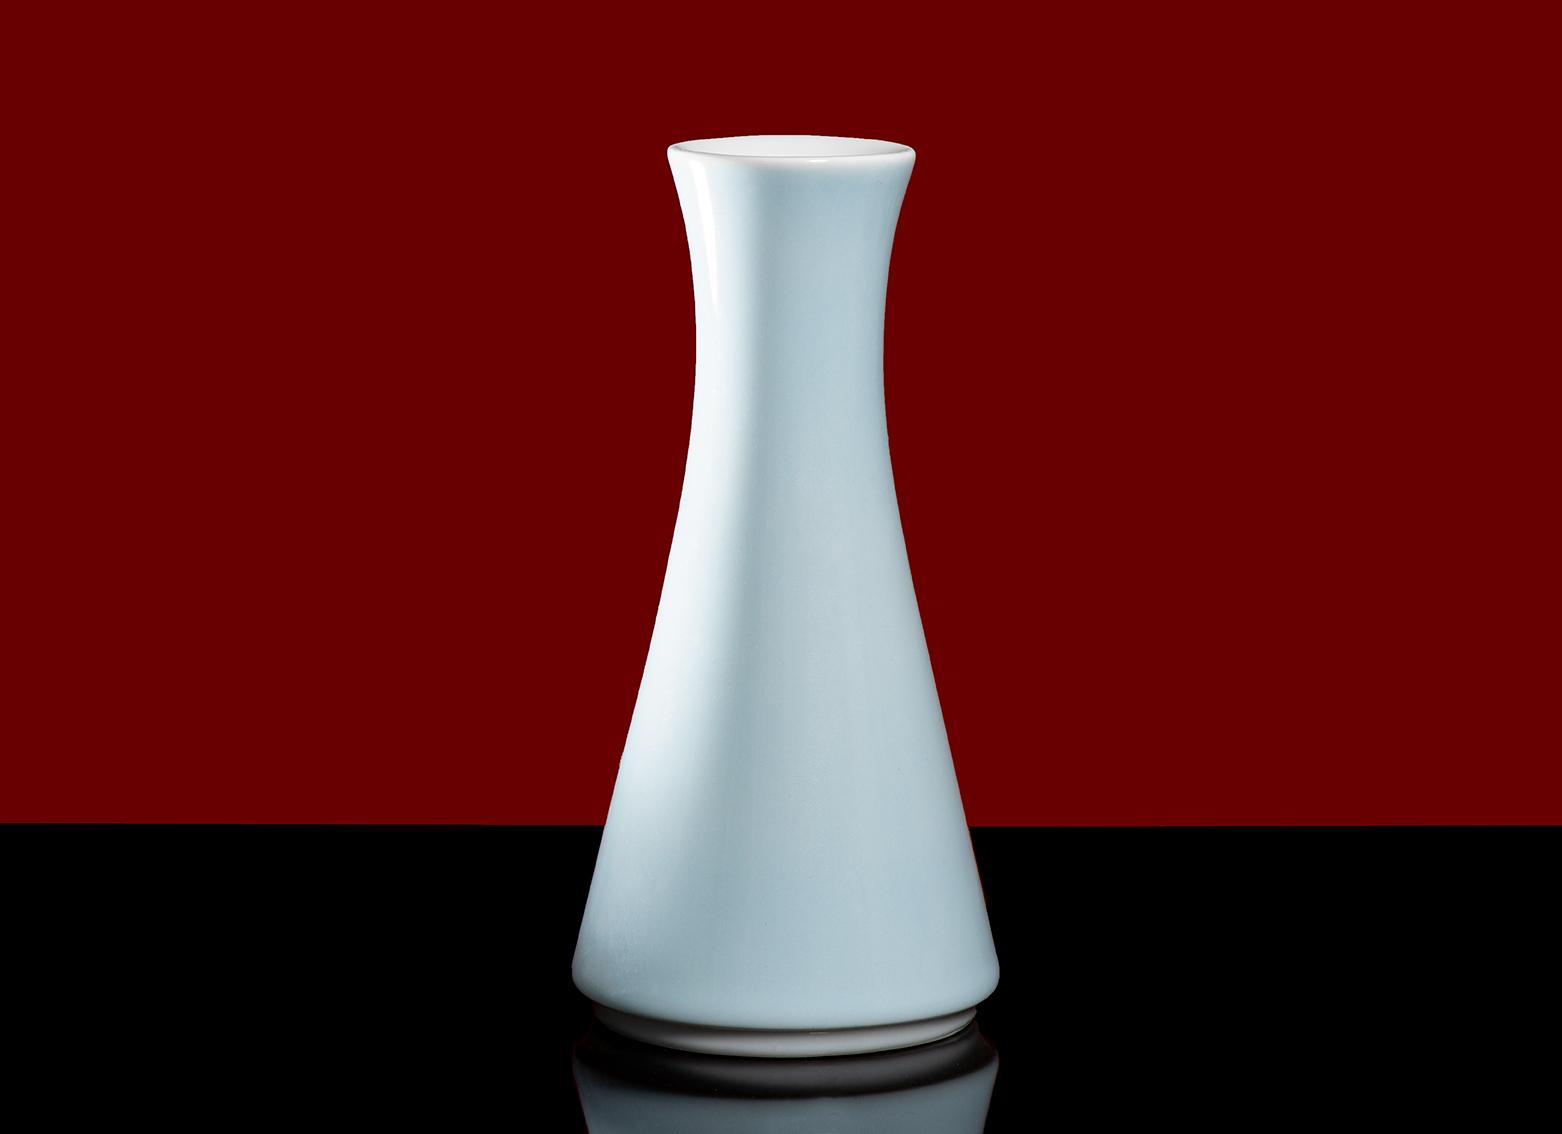 Produktfotograf für Vasen, Stills & Stop Motion: Melania MECE